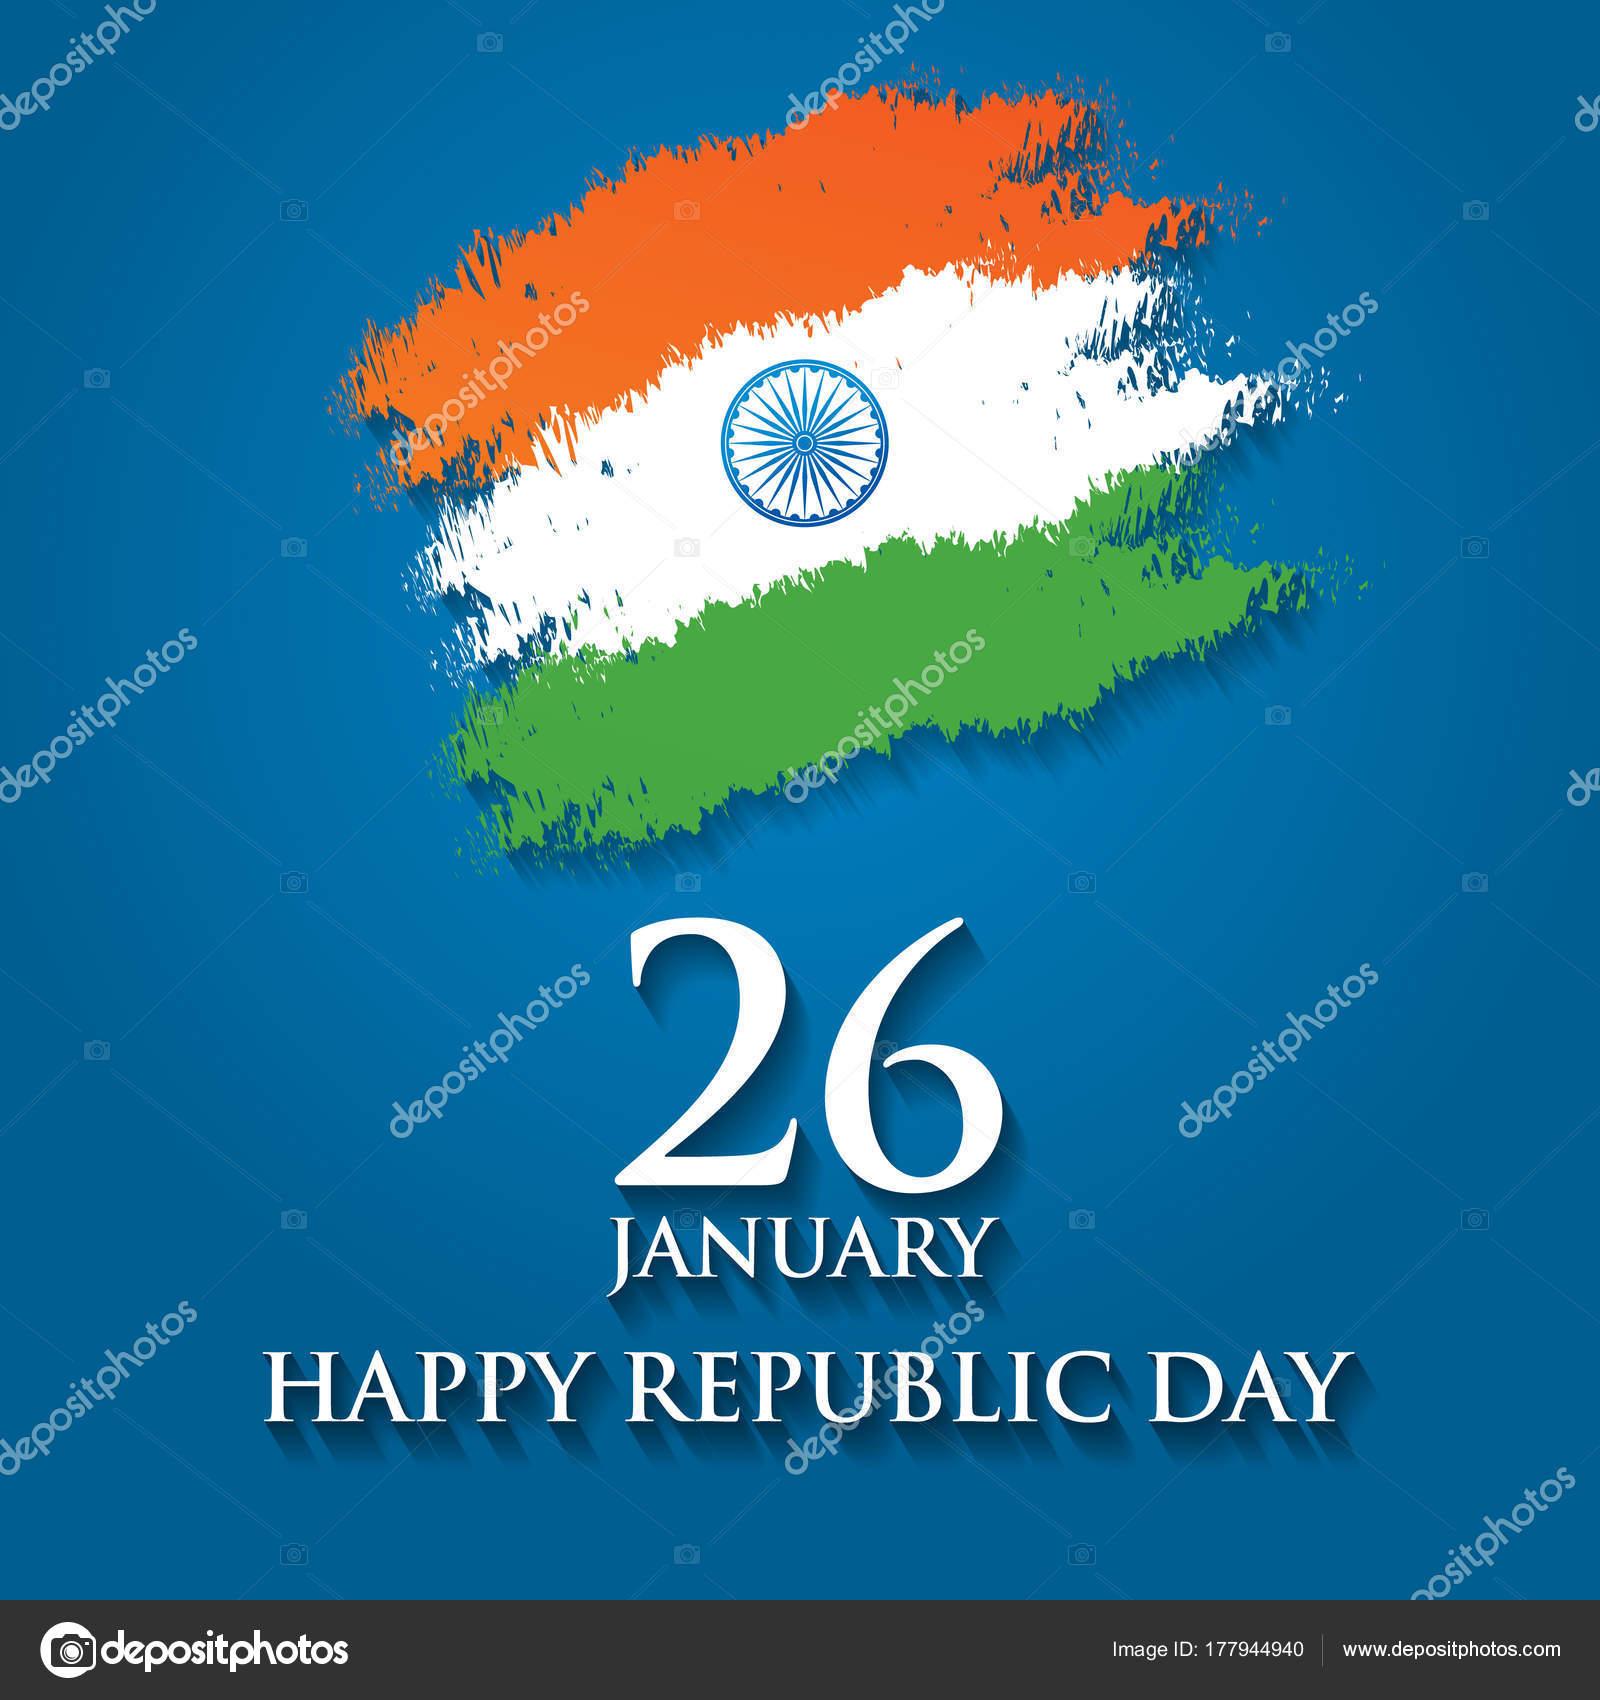 India republic day greeting card design vector illustration 26 india republic day greeting card design vector illustration 26 stock vector m4hsunfo